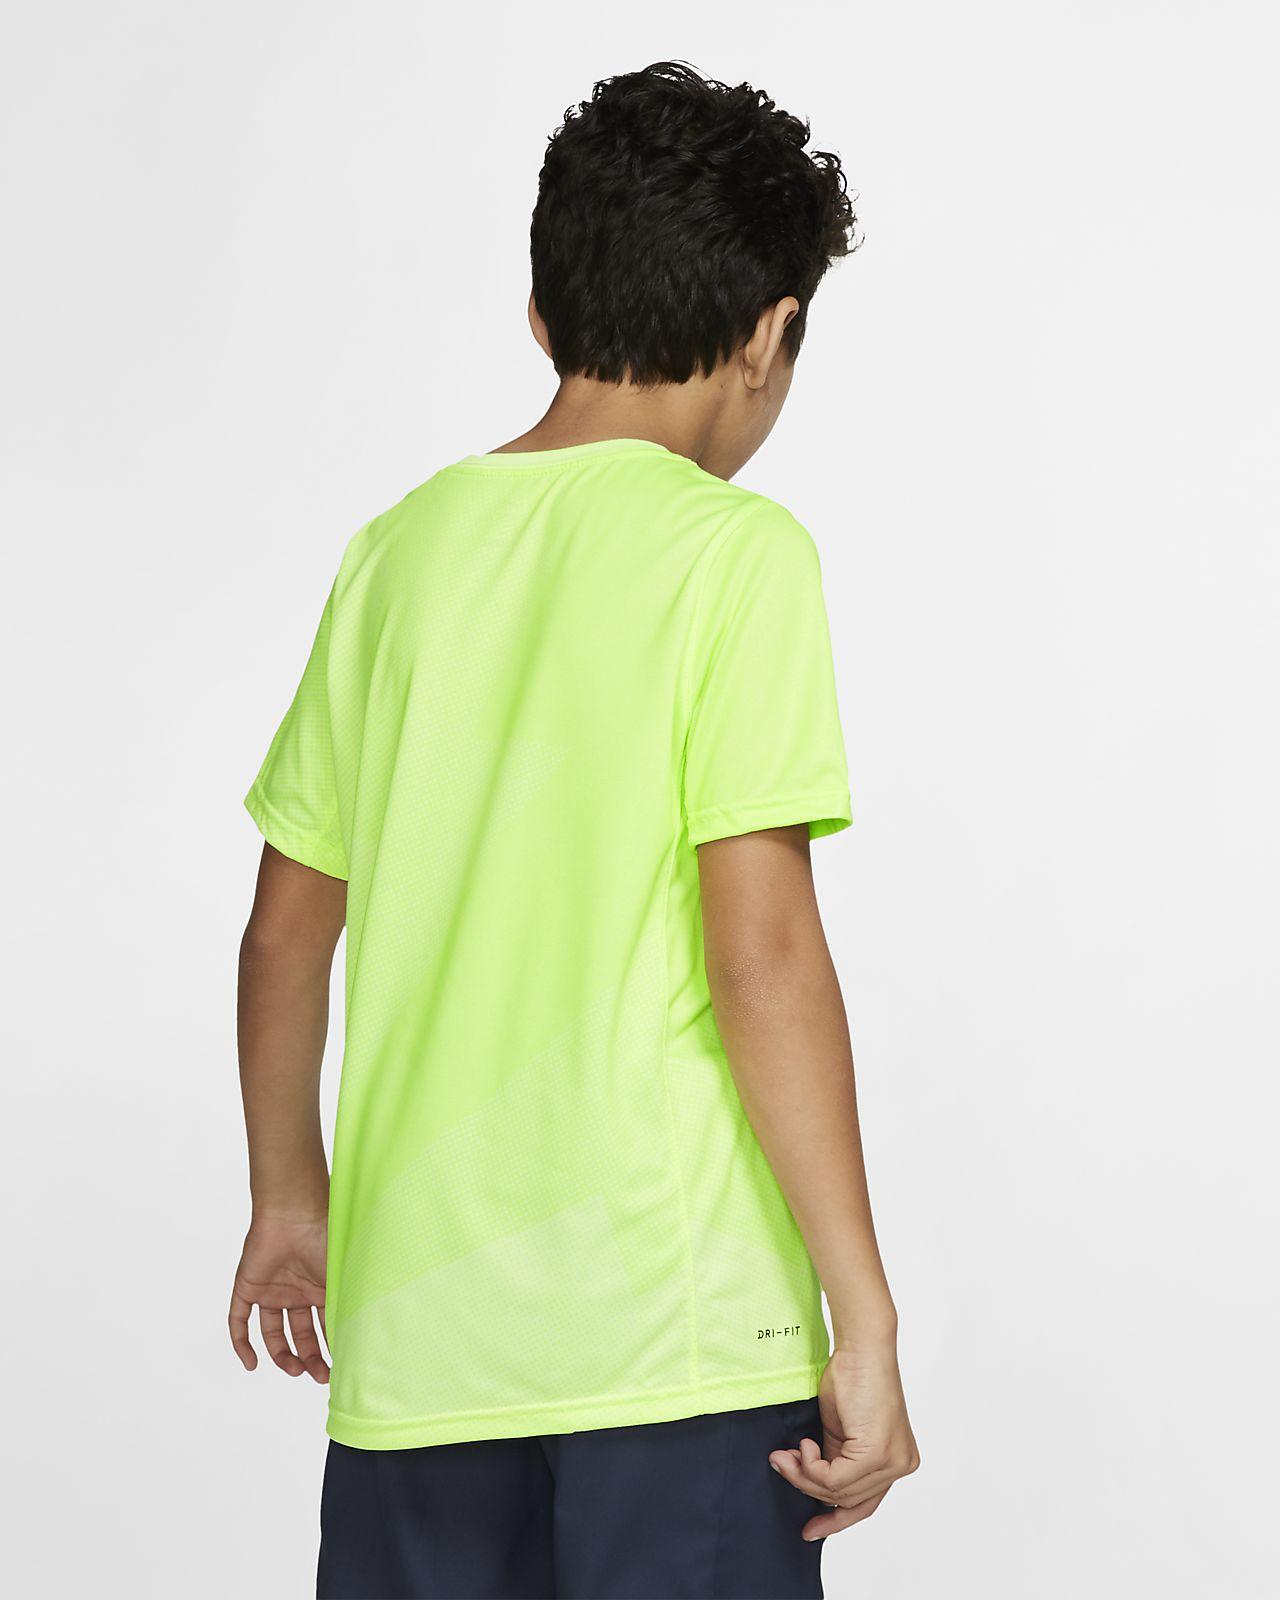 Rafa Tennis-T-Shirt für ältere Kinder (Jungen)